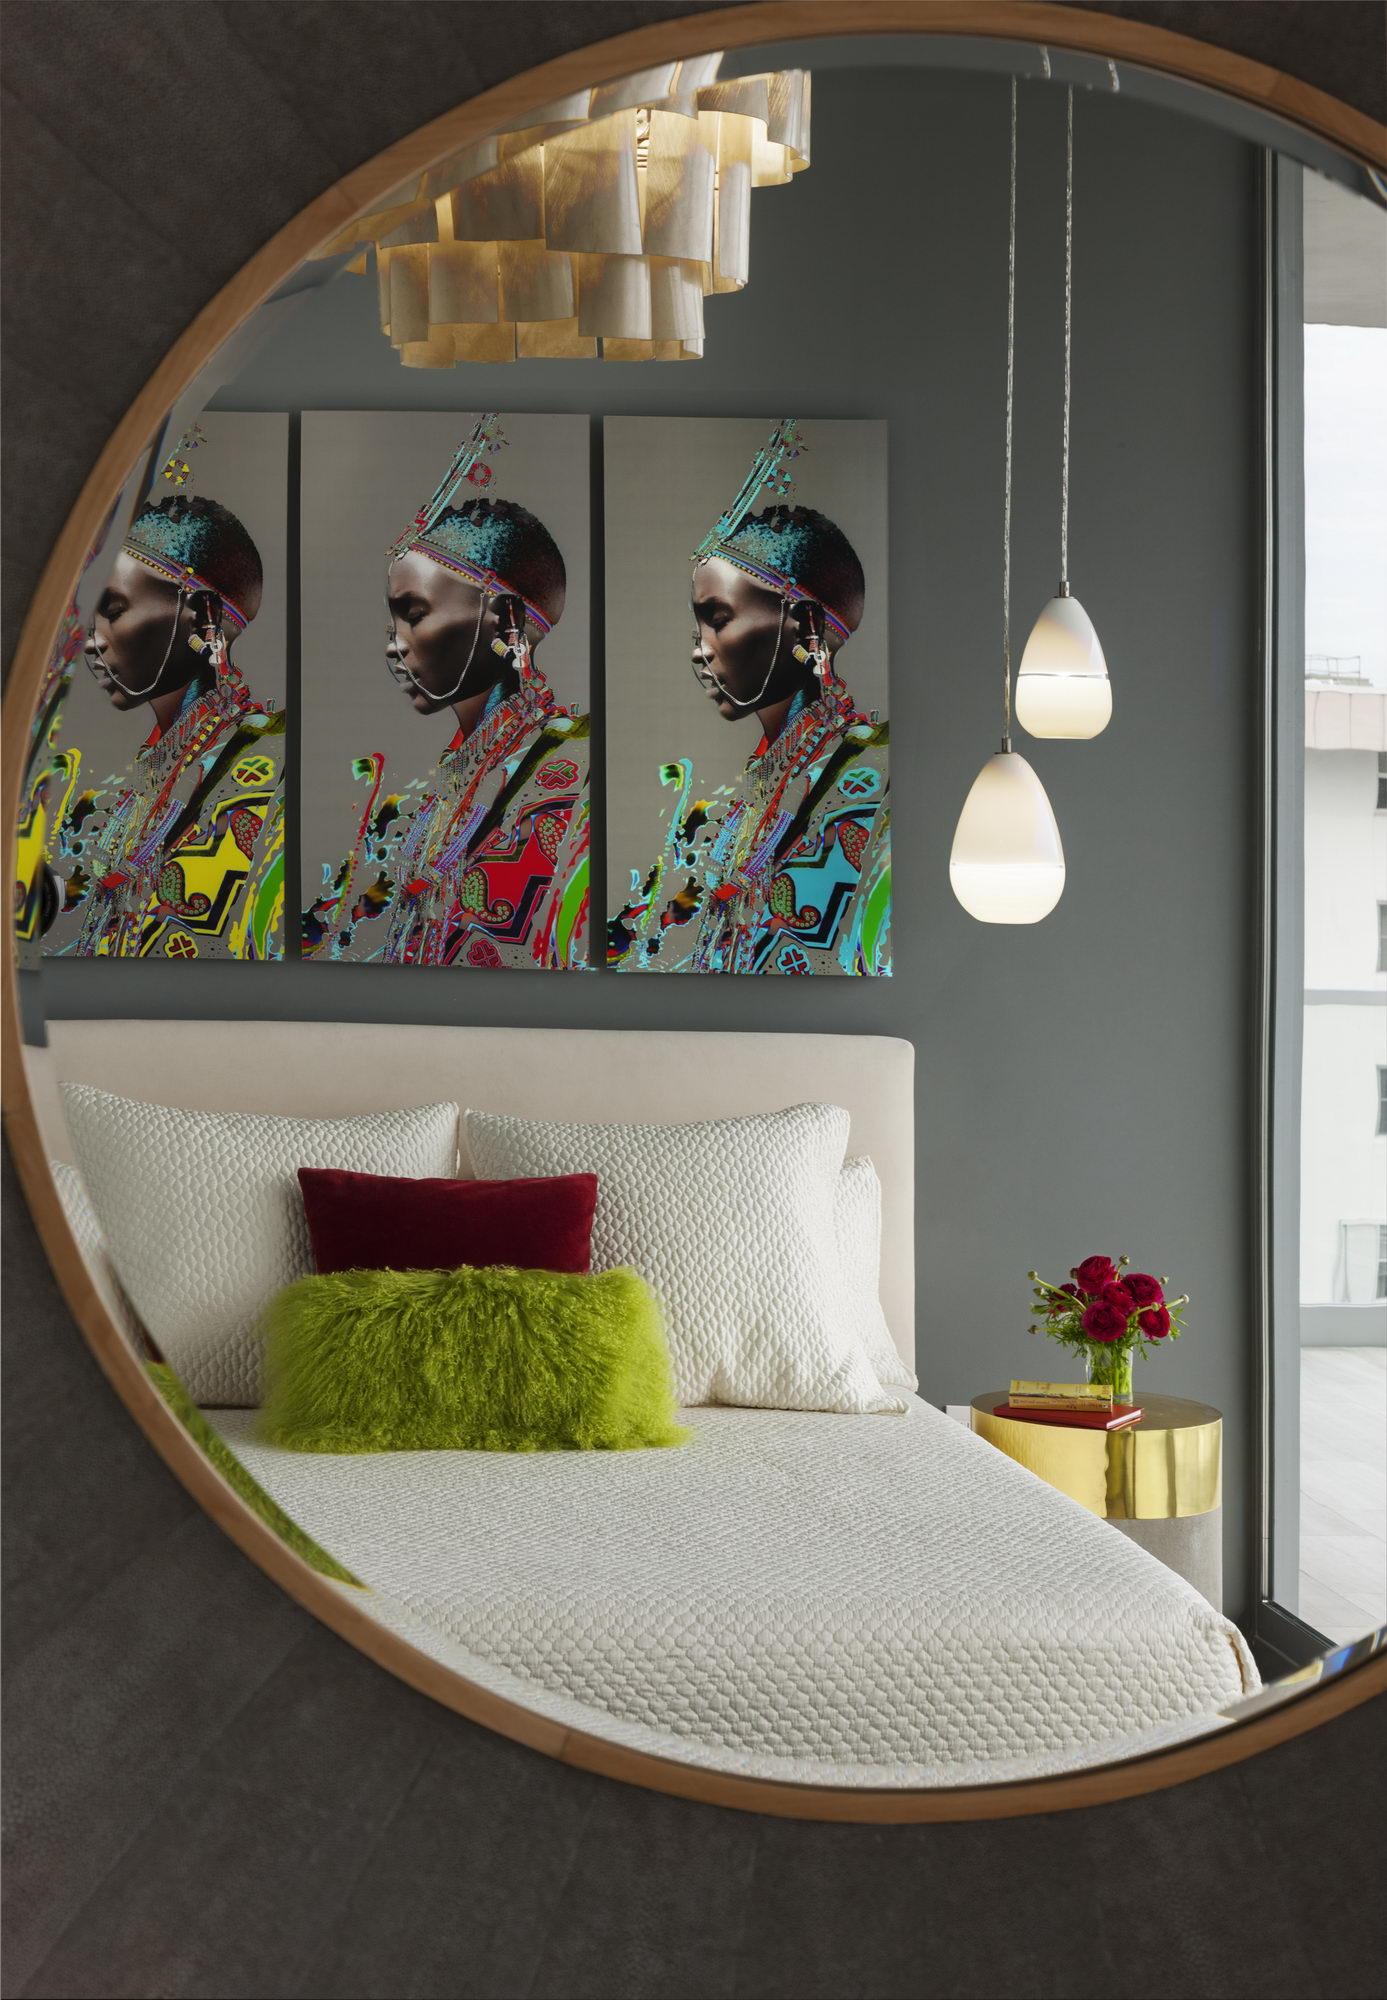 Ocean penthouse beach view south beach Miami Florida contemporary apartment mirror bedroom African art